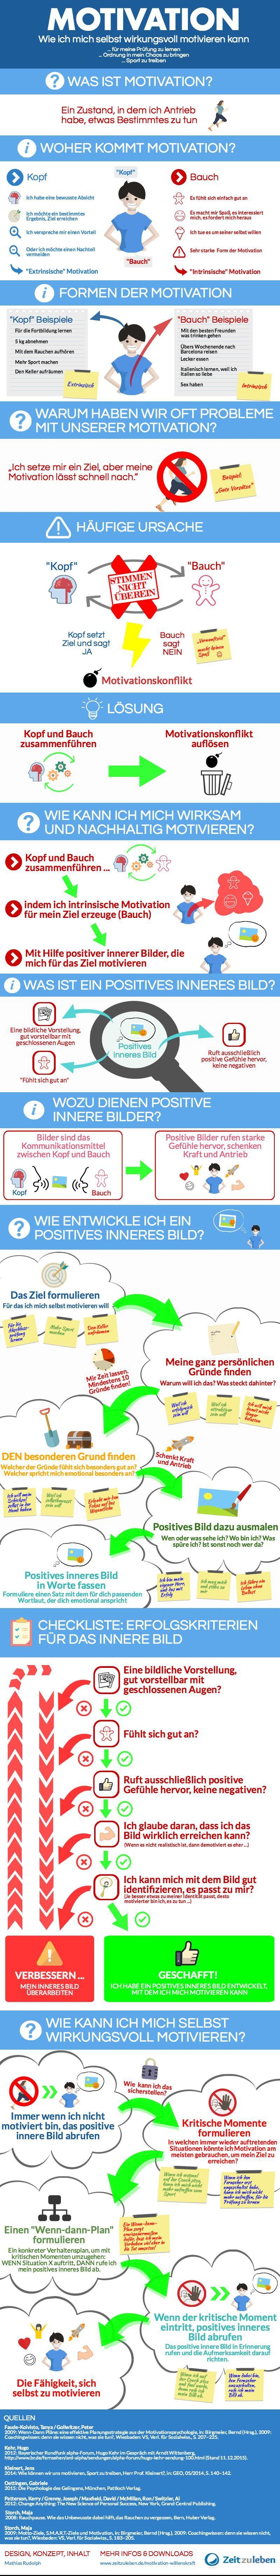 Infografik Motivation Wie Kann Ich Mich Selbst Motivieren Motivation Infografik Selbstmotivation